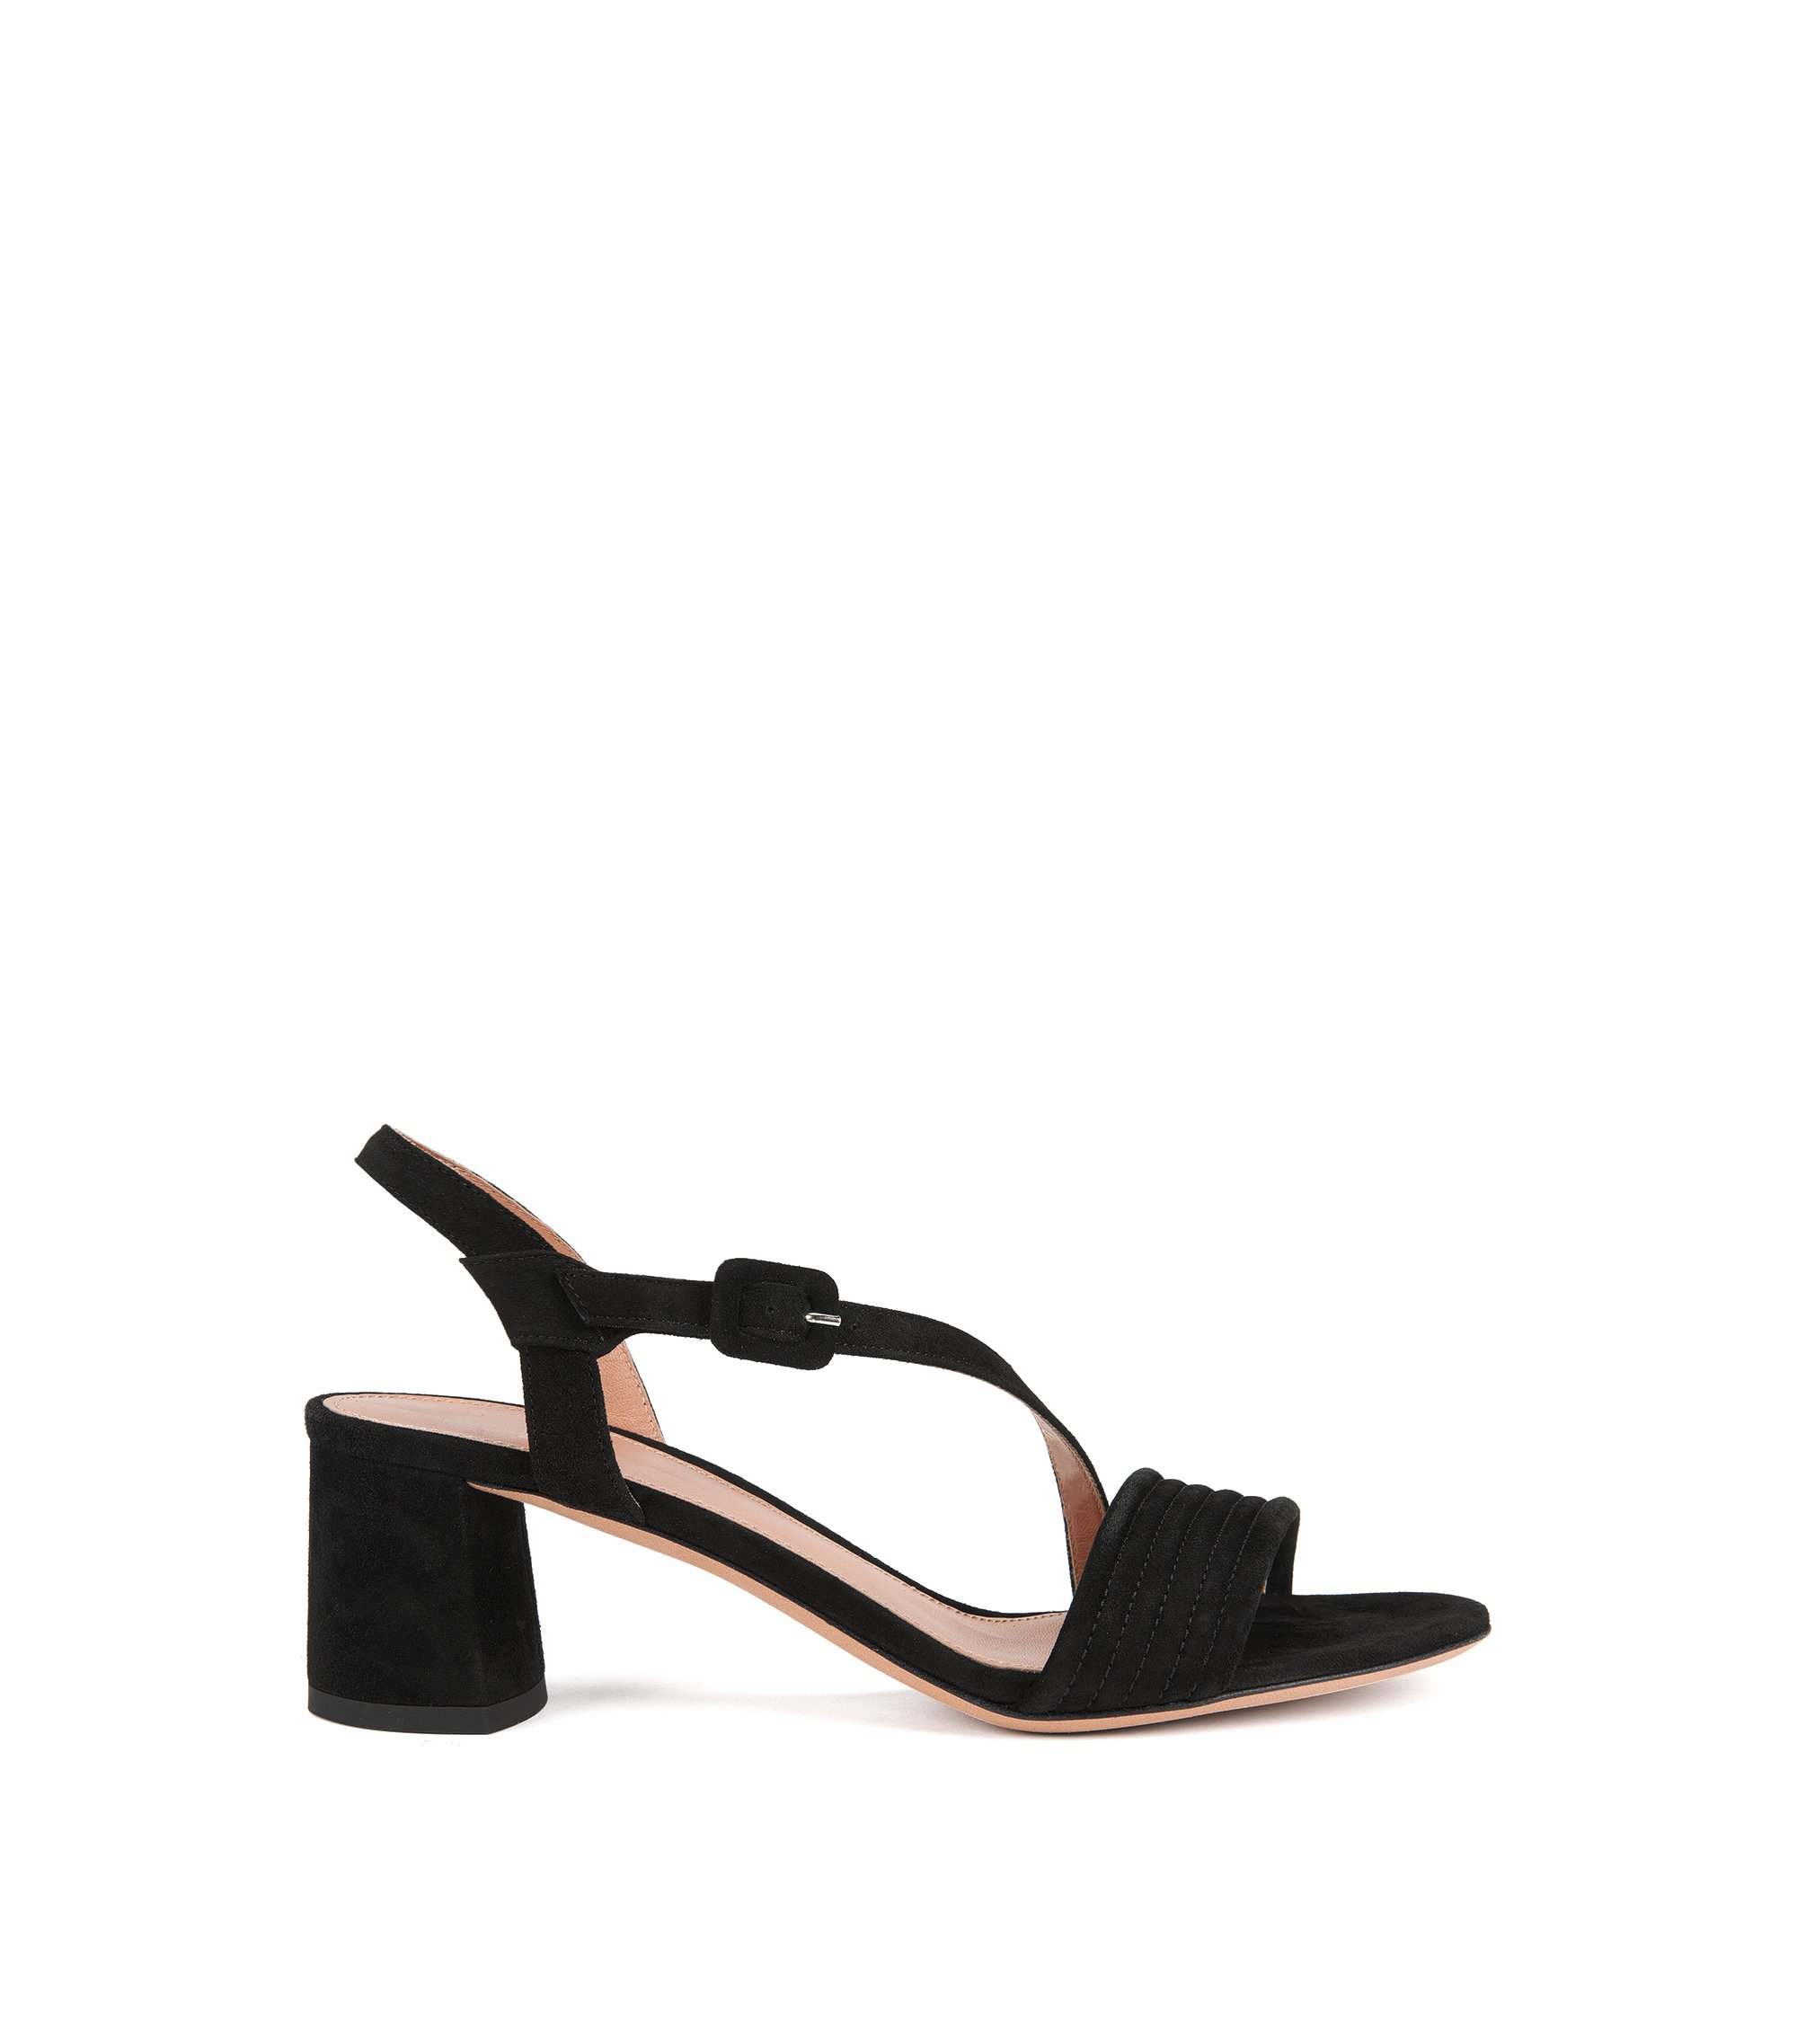 Suede Sandal | Scarlett Sandal S, Black